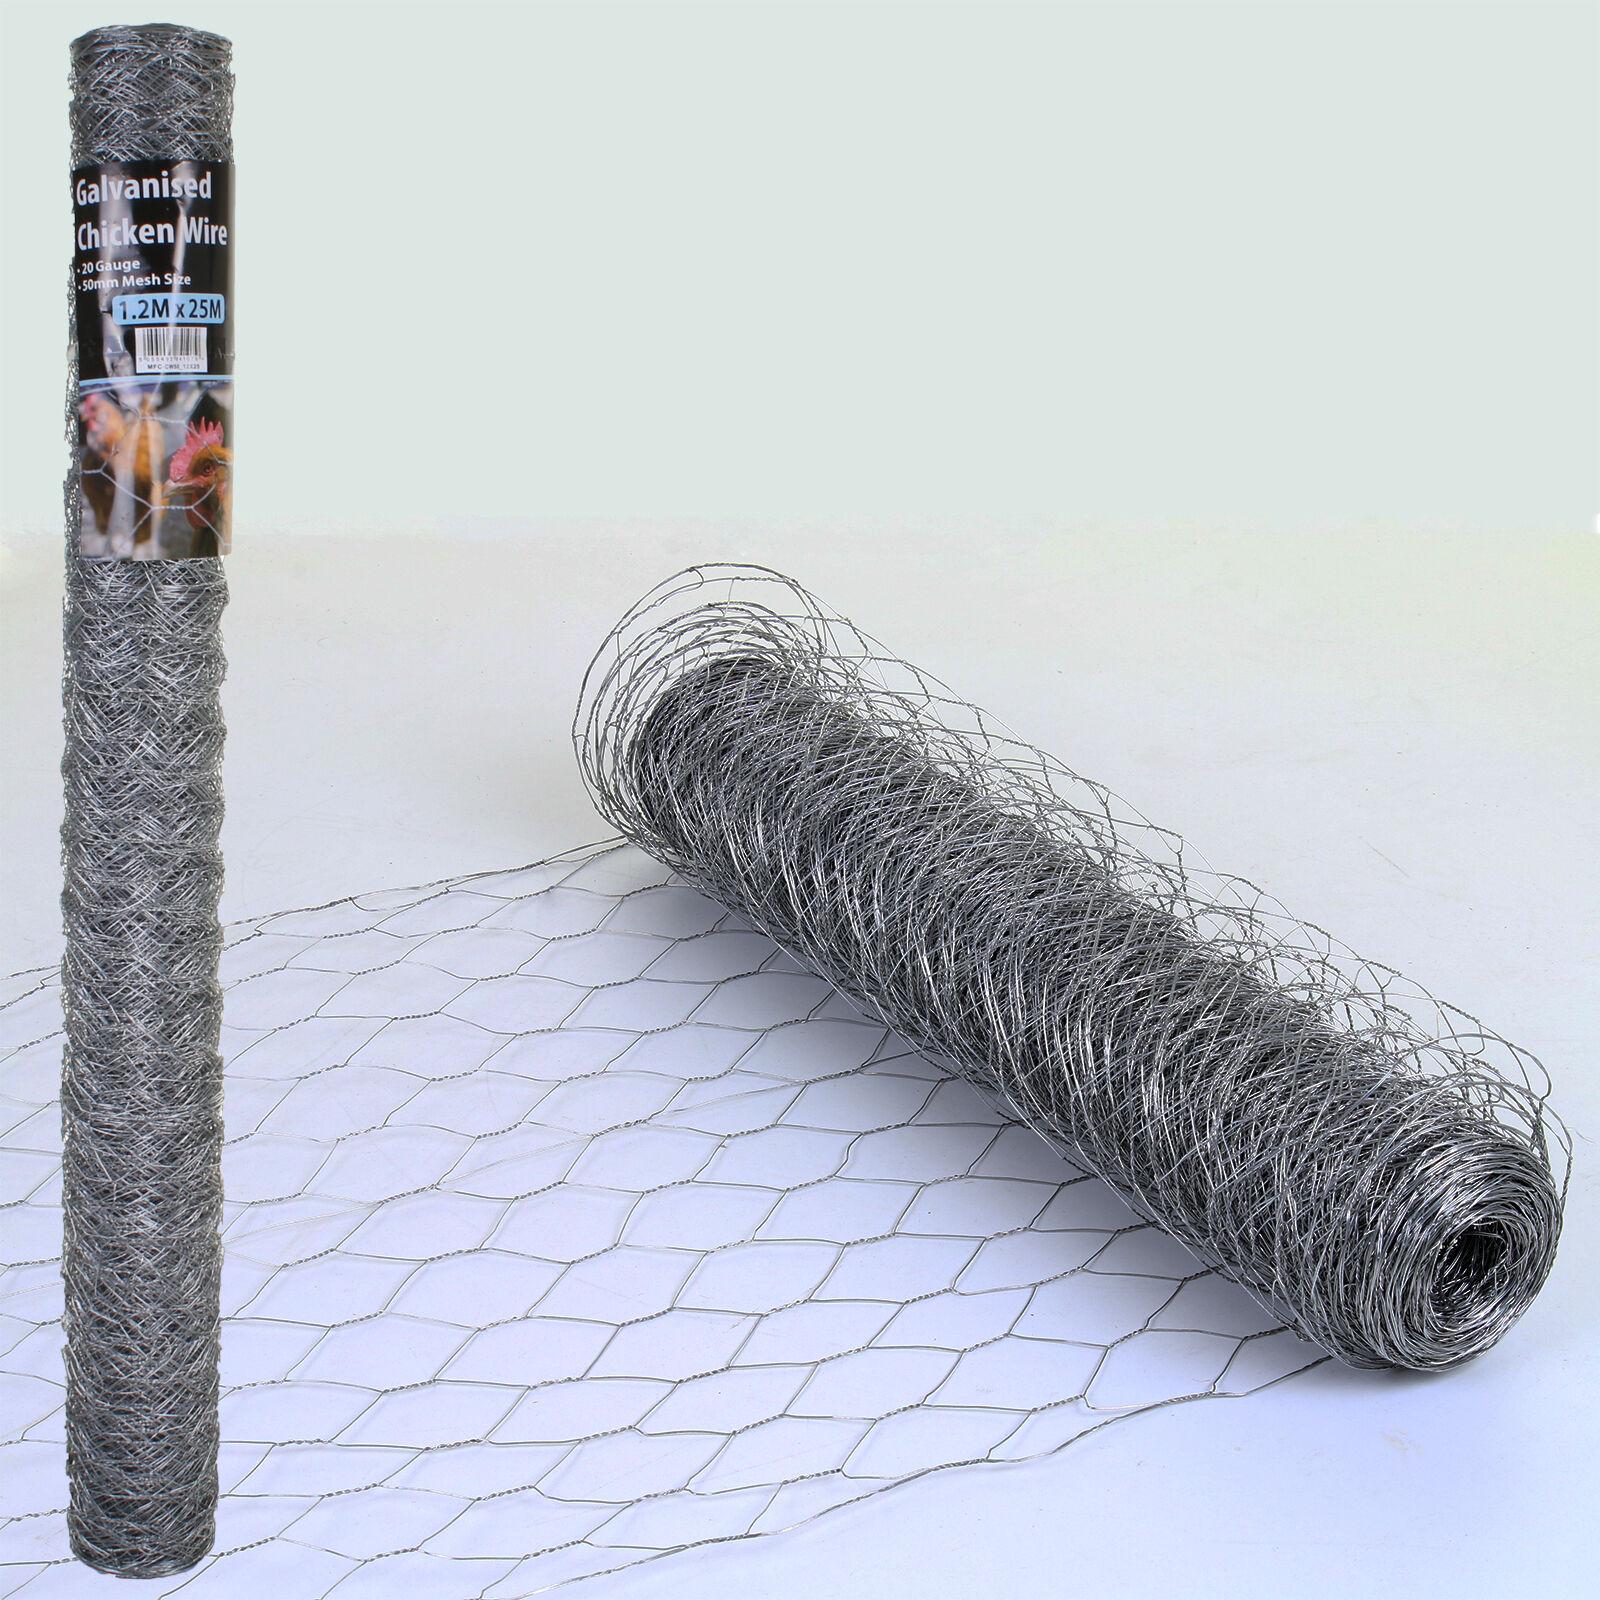 Magnificent Hardware Cloth Vs Chicken Wire Component - Wiring ...